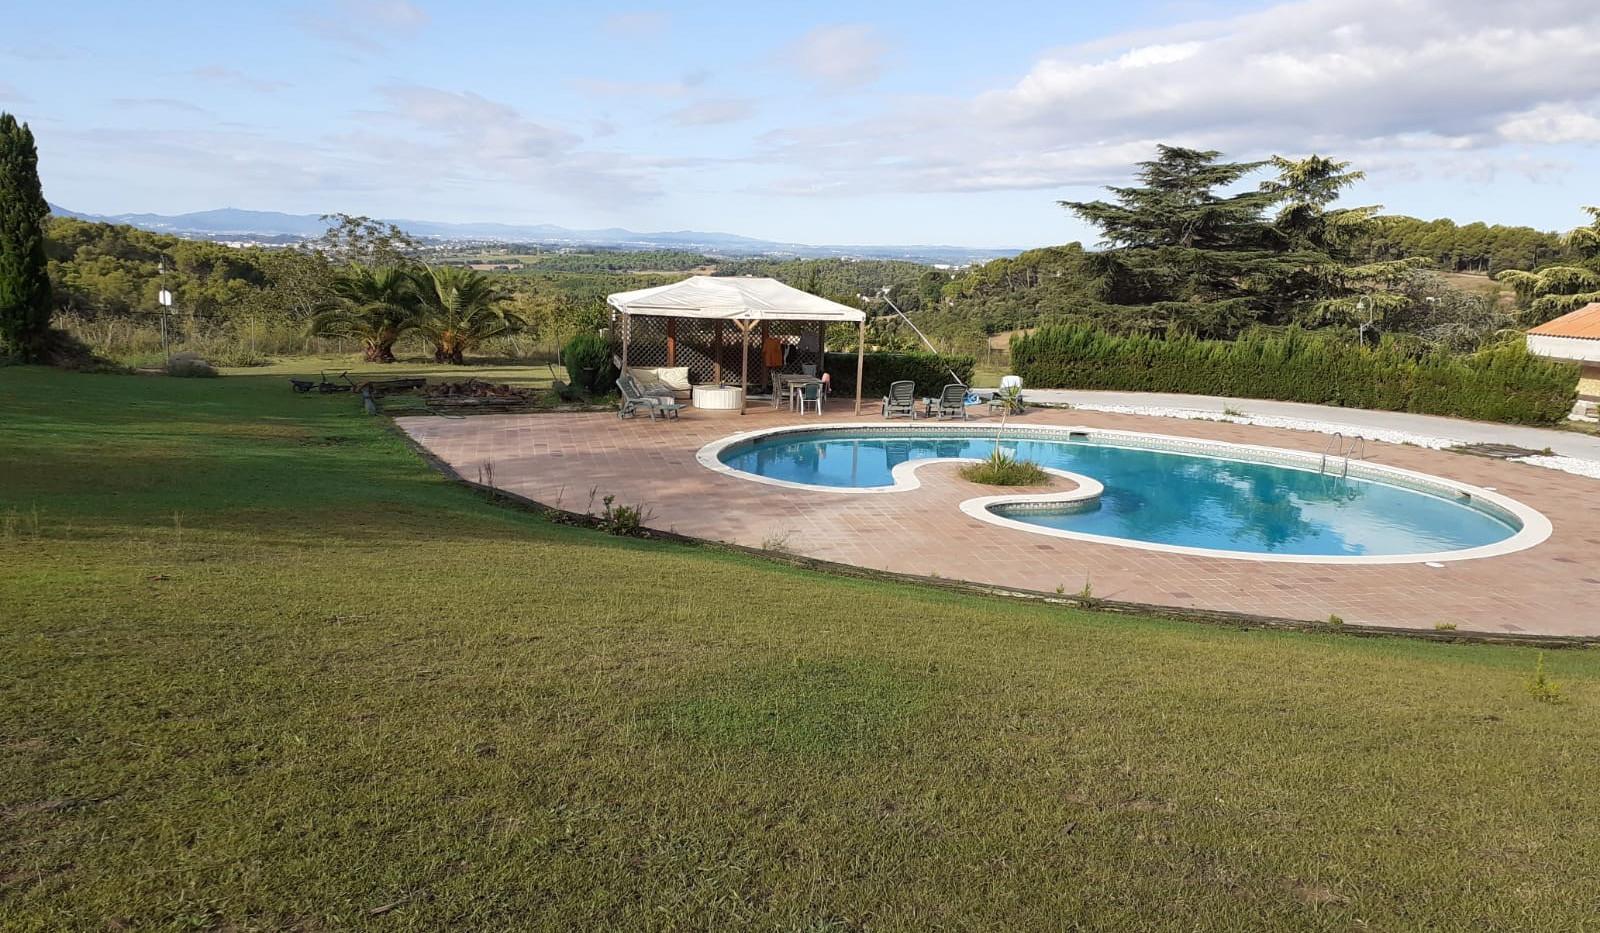 piscina y jardin.JPG